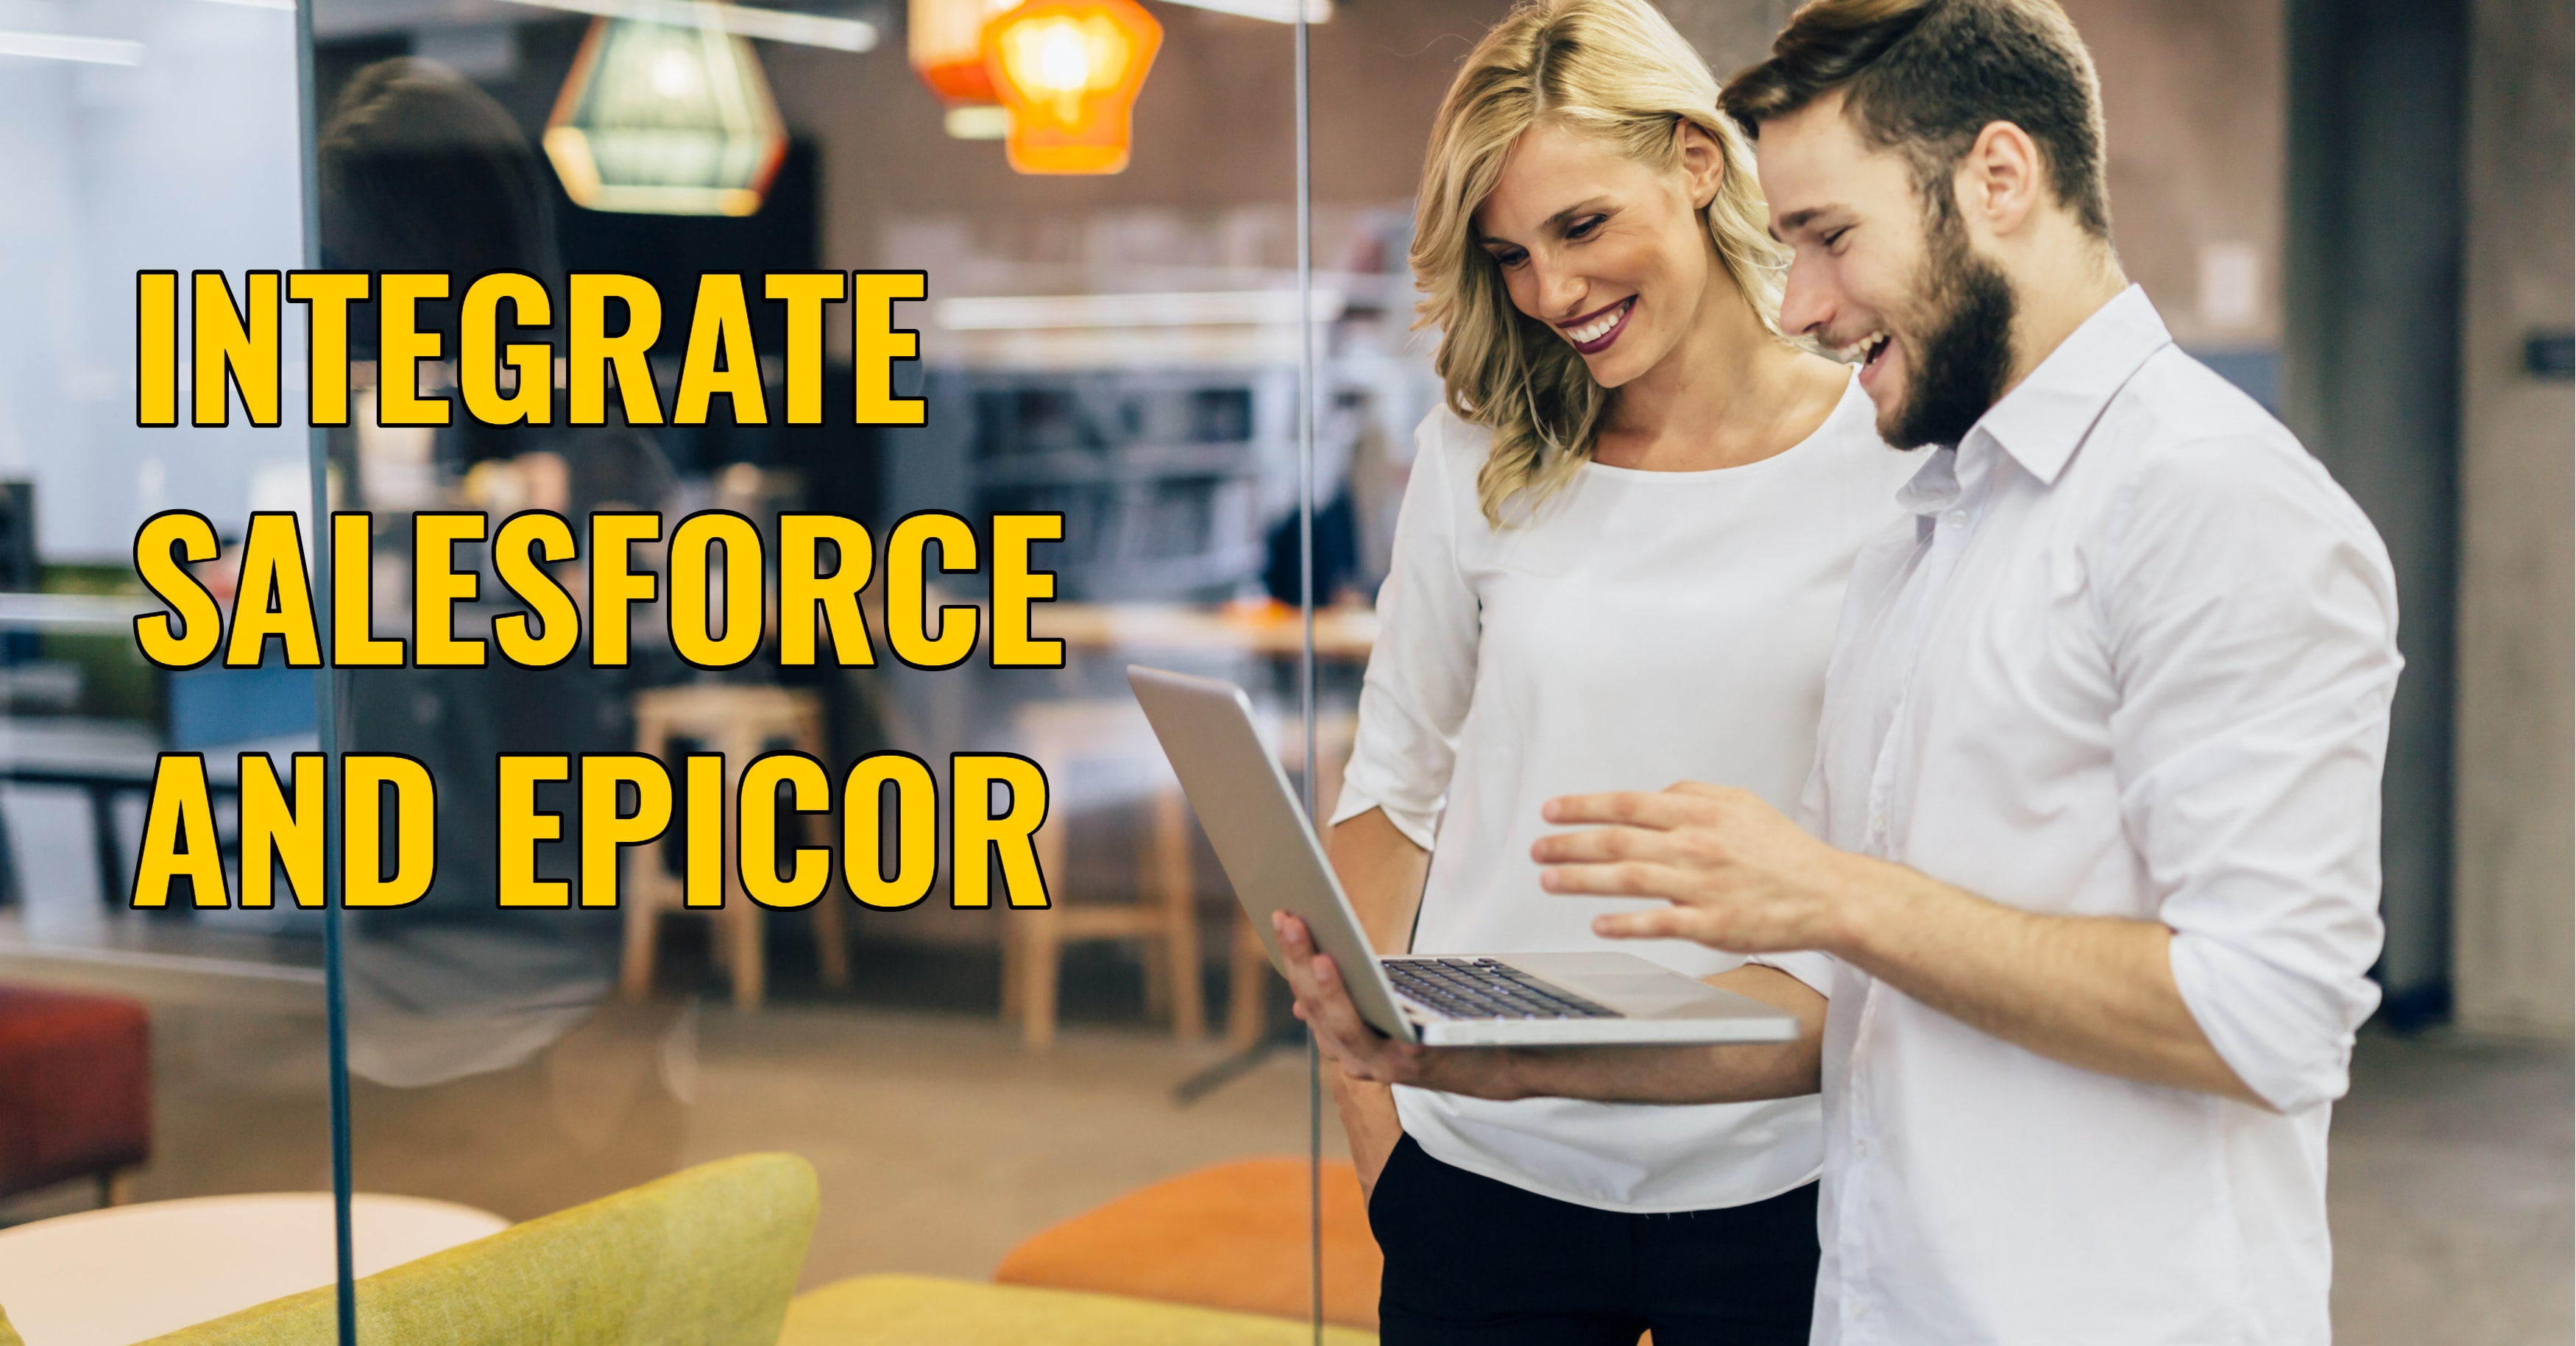 Integrate Salesforce Epicor